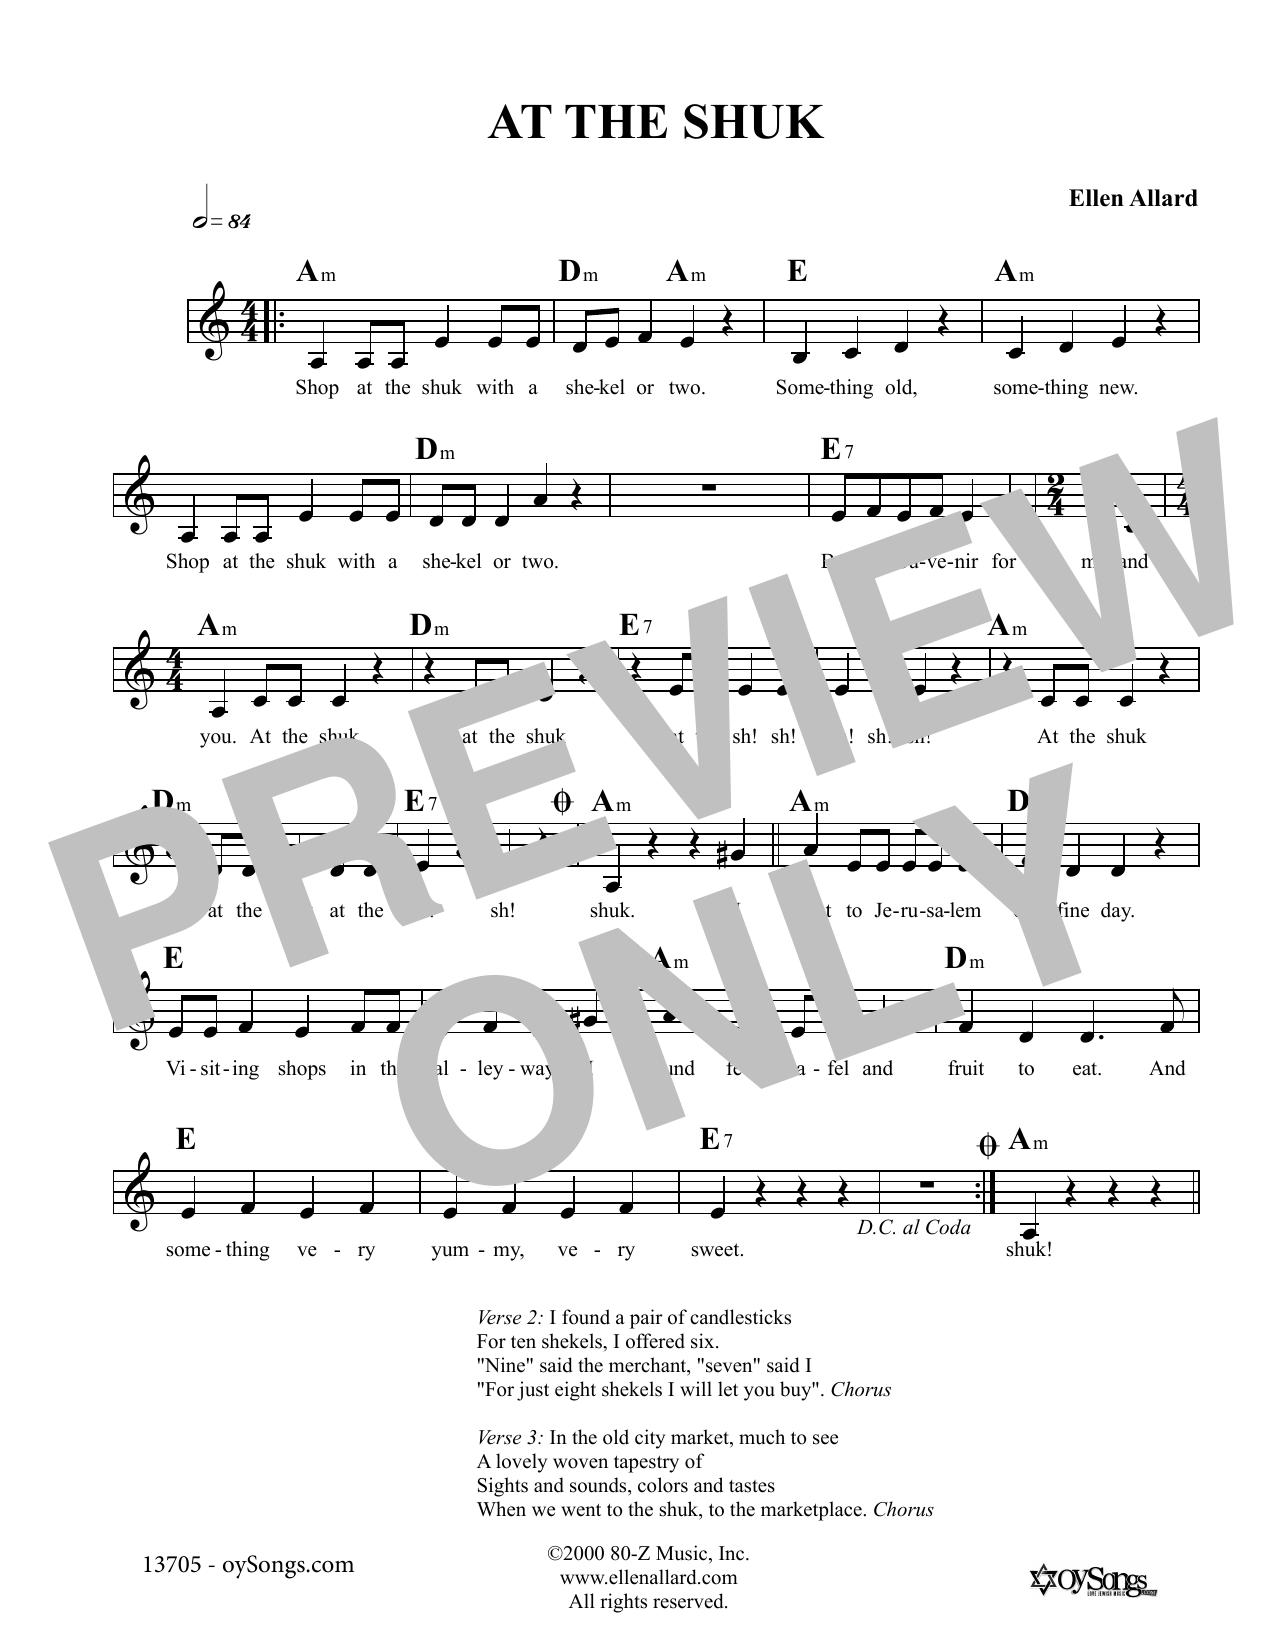 Ellen Allard At The Shuk sheet music notes and chords. Download Printable PDF.